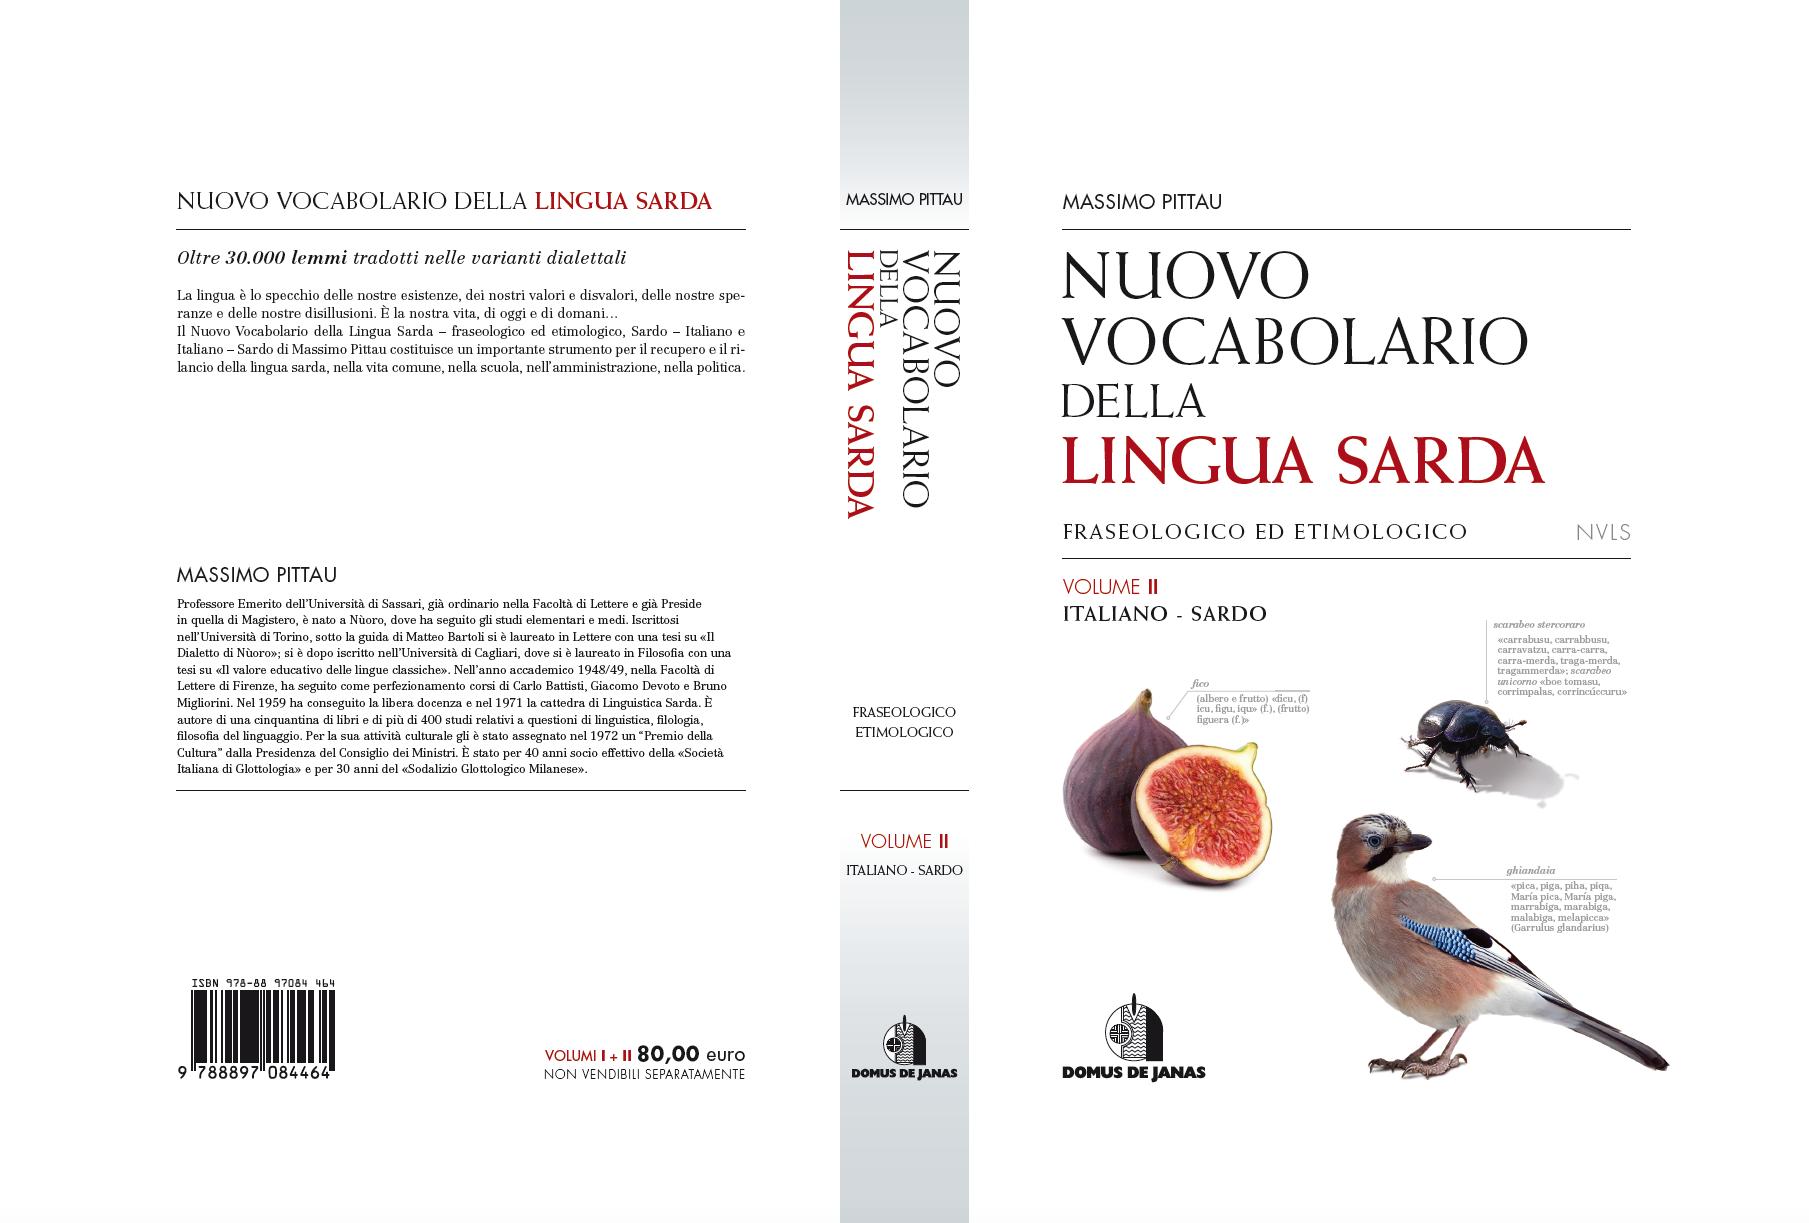 Vocabolario della Lingua Sarda_Vol2